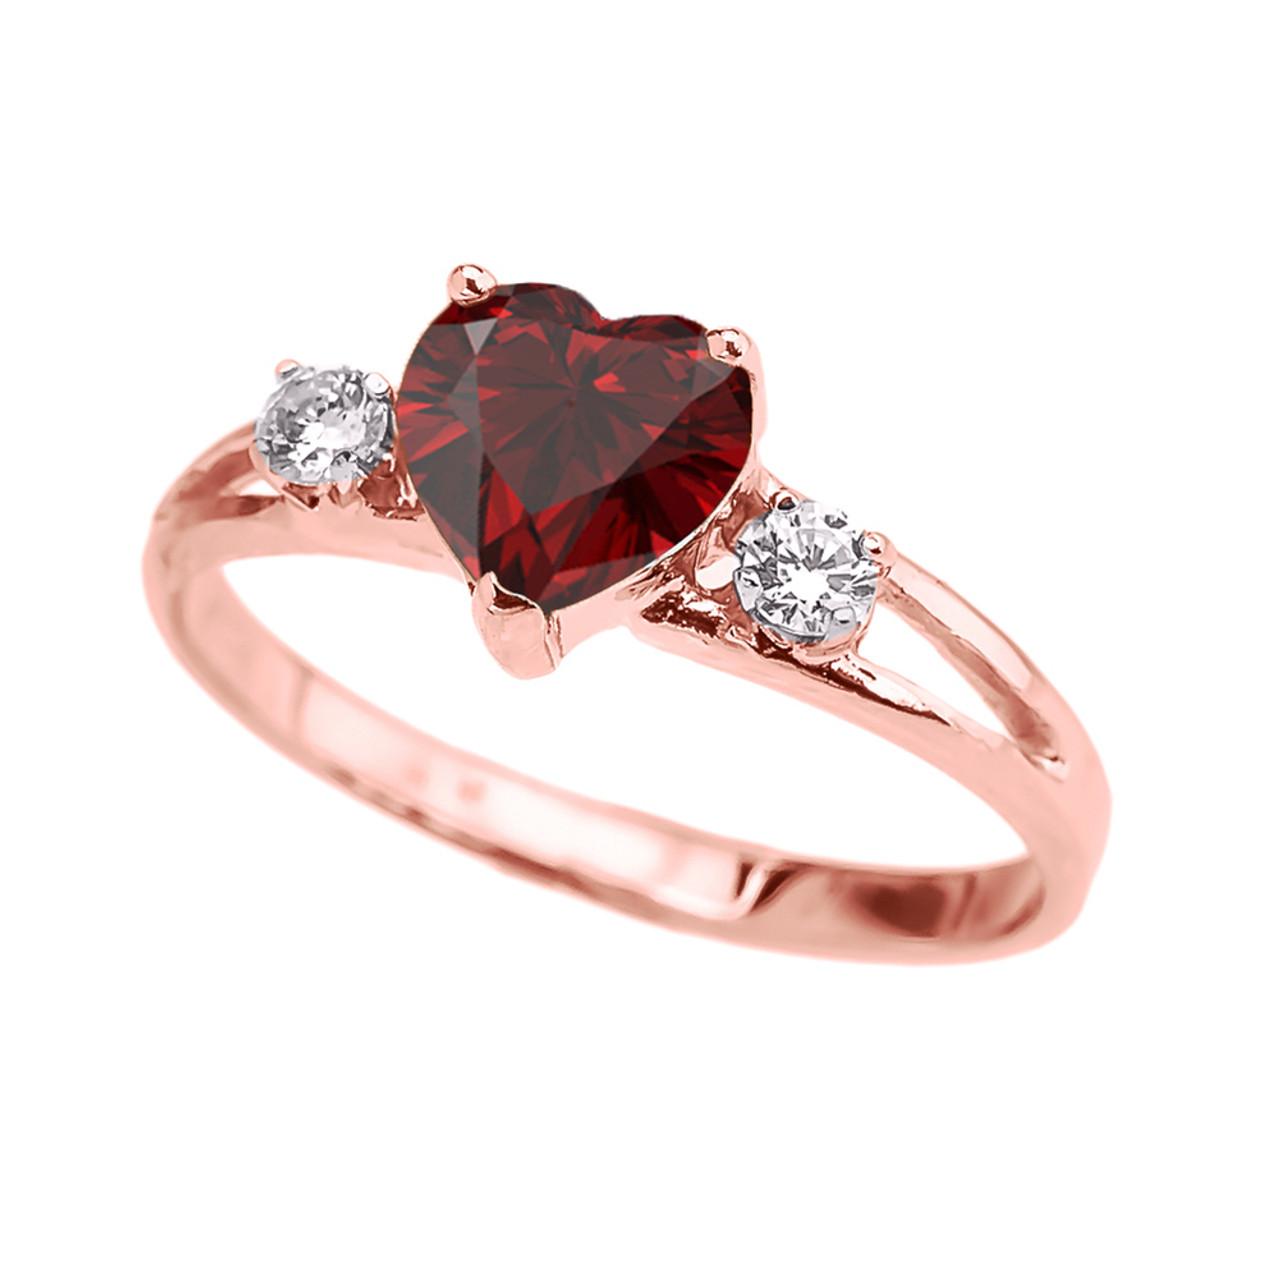 Rose Gold Garnet Heart White Topaz Proposalpromise Ring. Ribbon Twist Wedding Rings. Legacy Tiffany Engagement Rings. 30th Anniversary Wedding Rings. Ceramic Engagement Rings. Flower Heart Wedding Rings. 2pc Wedding Rings. Washer Rings. Amazing Engagement Rings